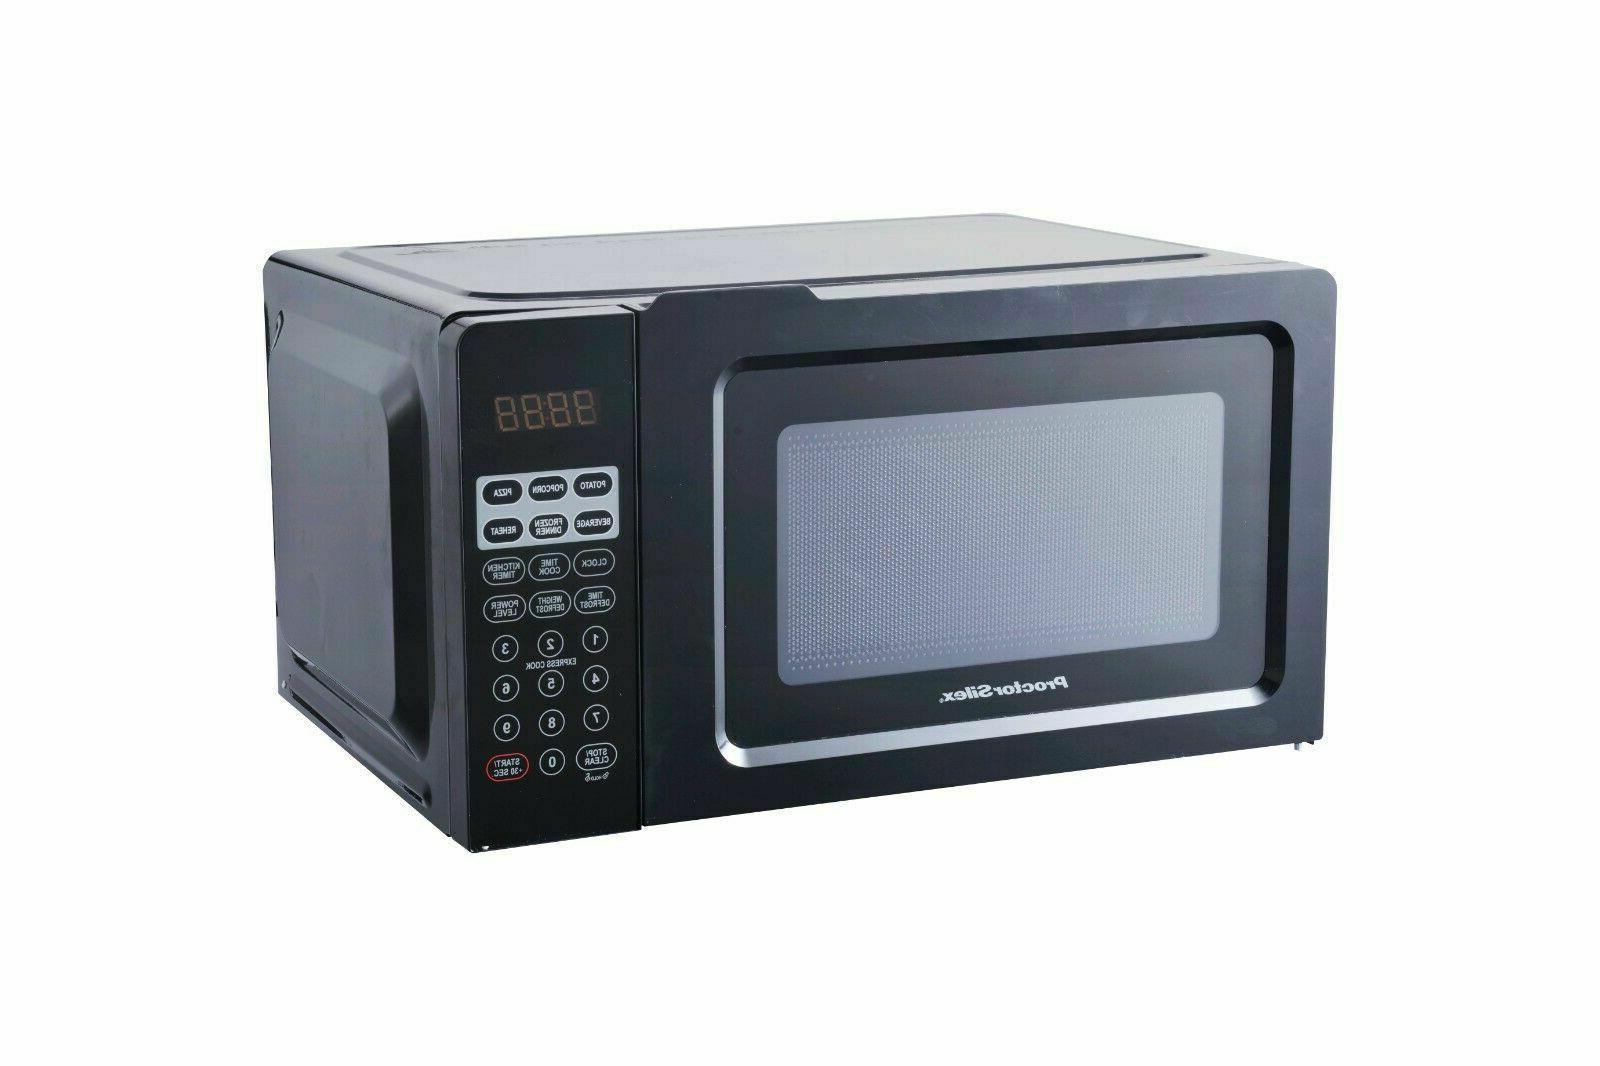 Black Digital Small Kitchen Appliances